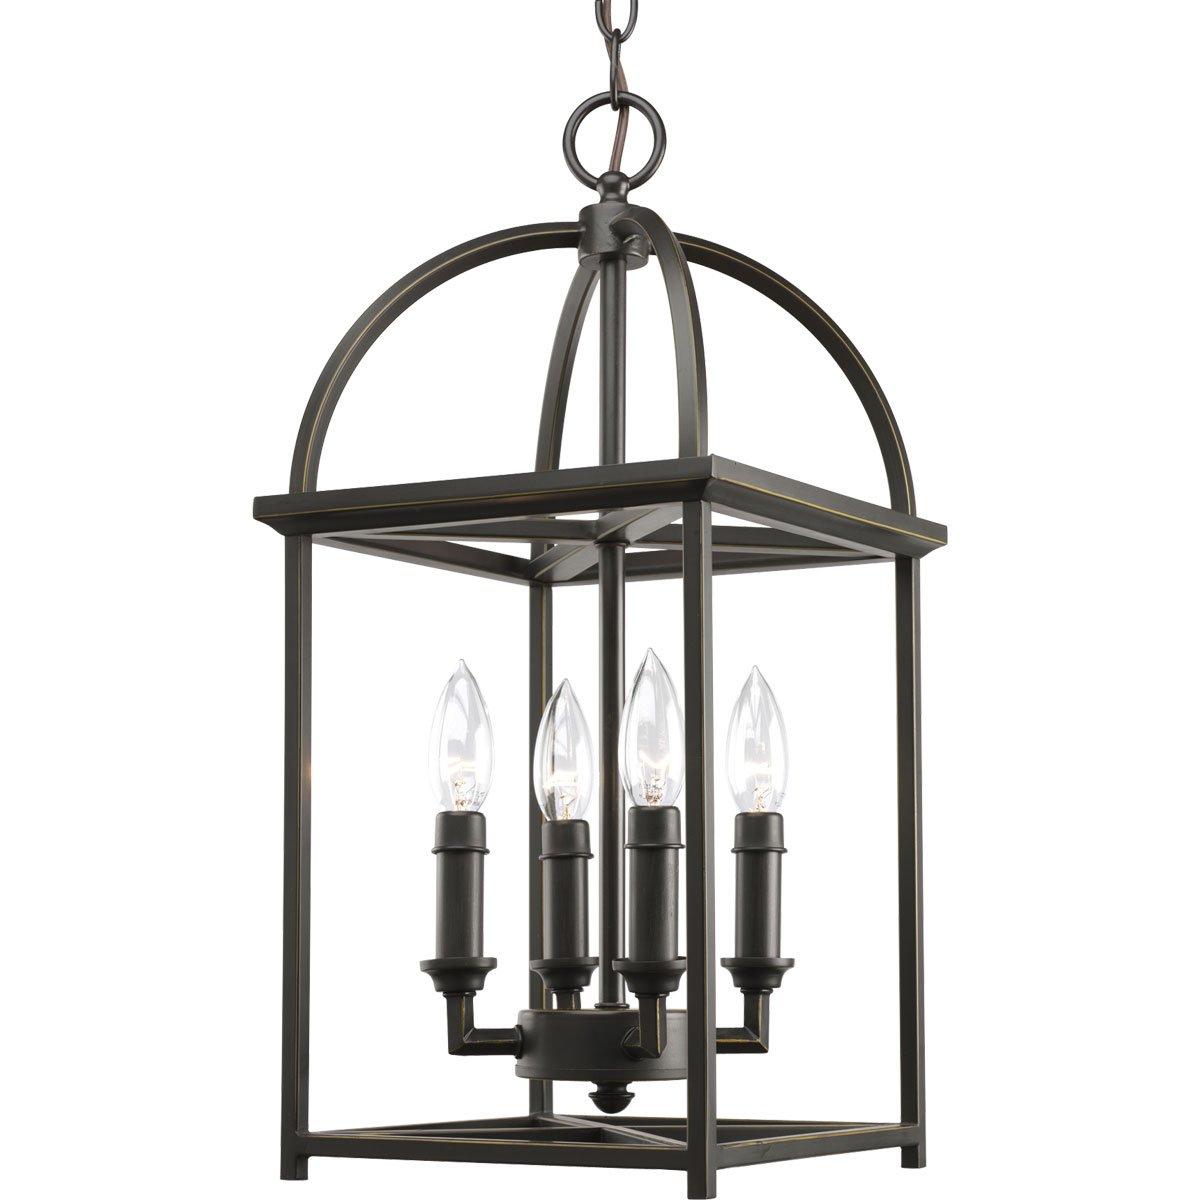 Progress Lighting P3884-20 Foyer Lantern 13-3/8-Inch Width x 20-3/8-Inch Height Antique Bronze